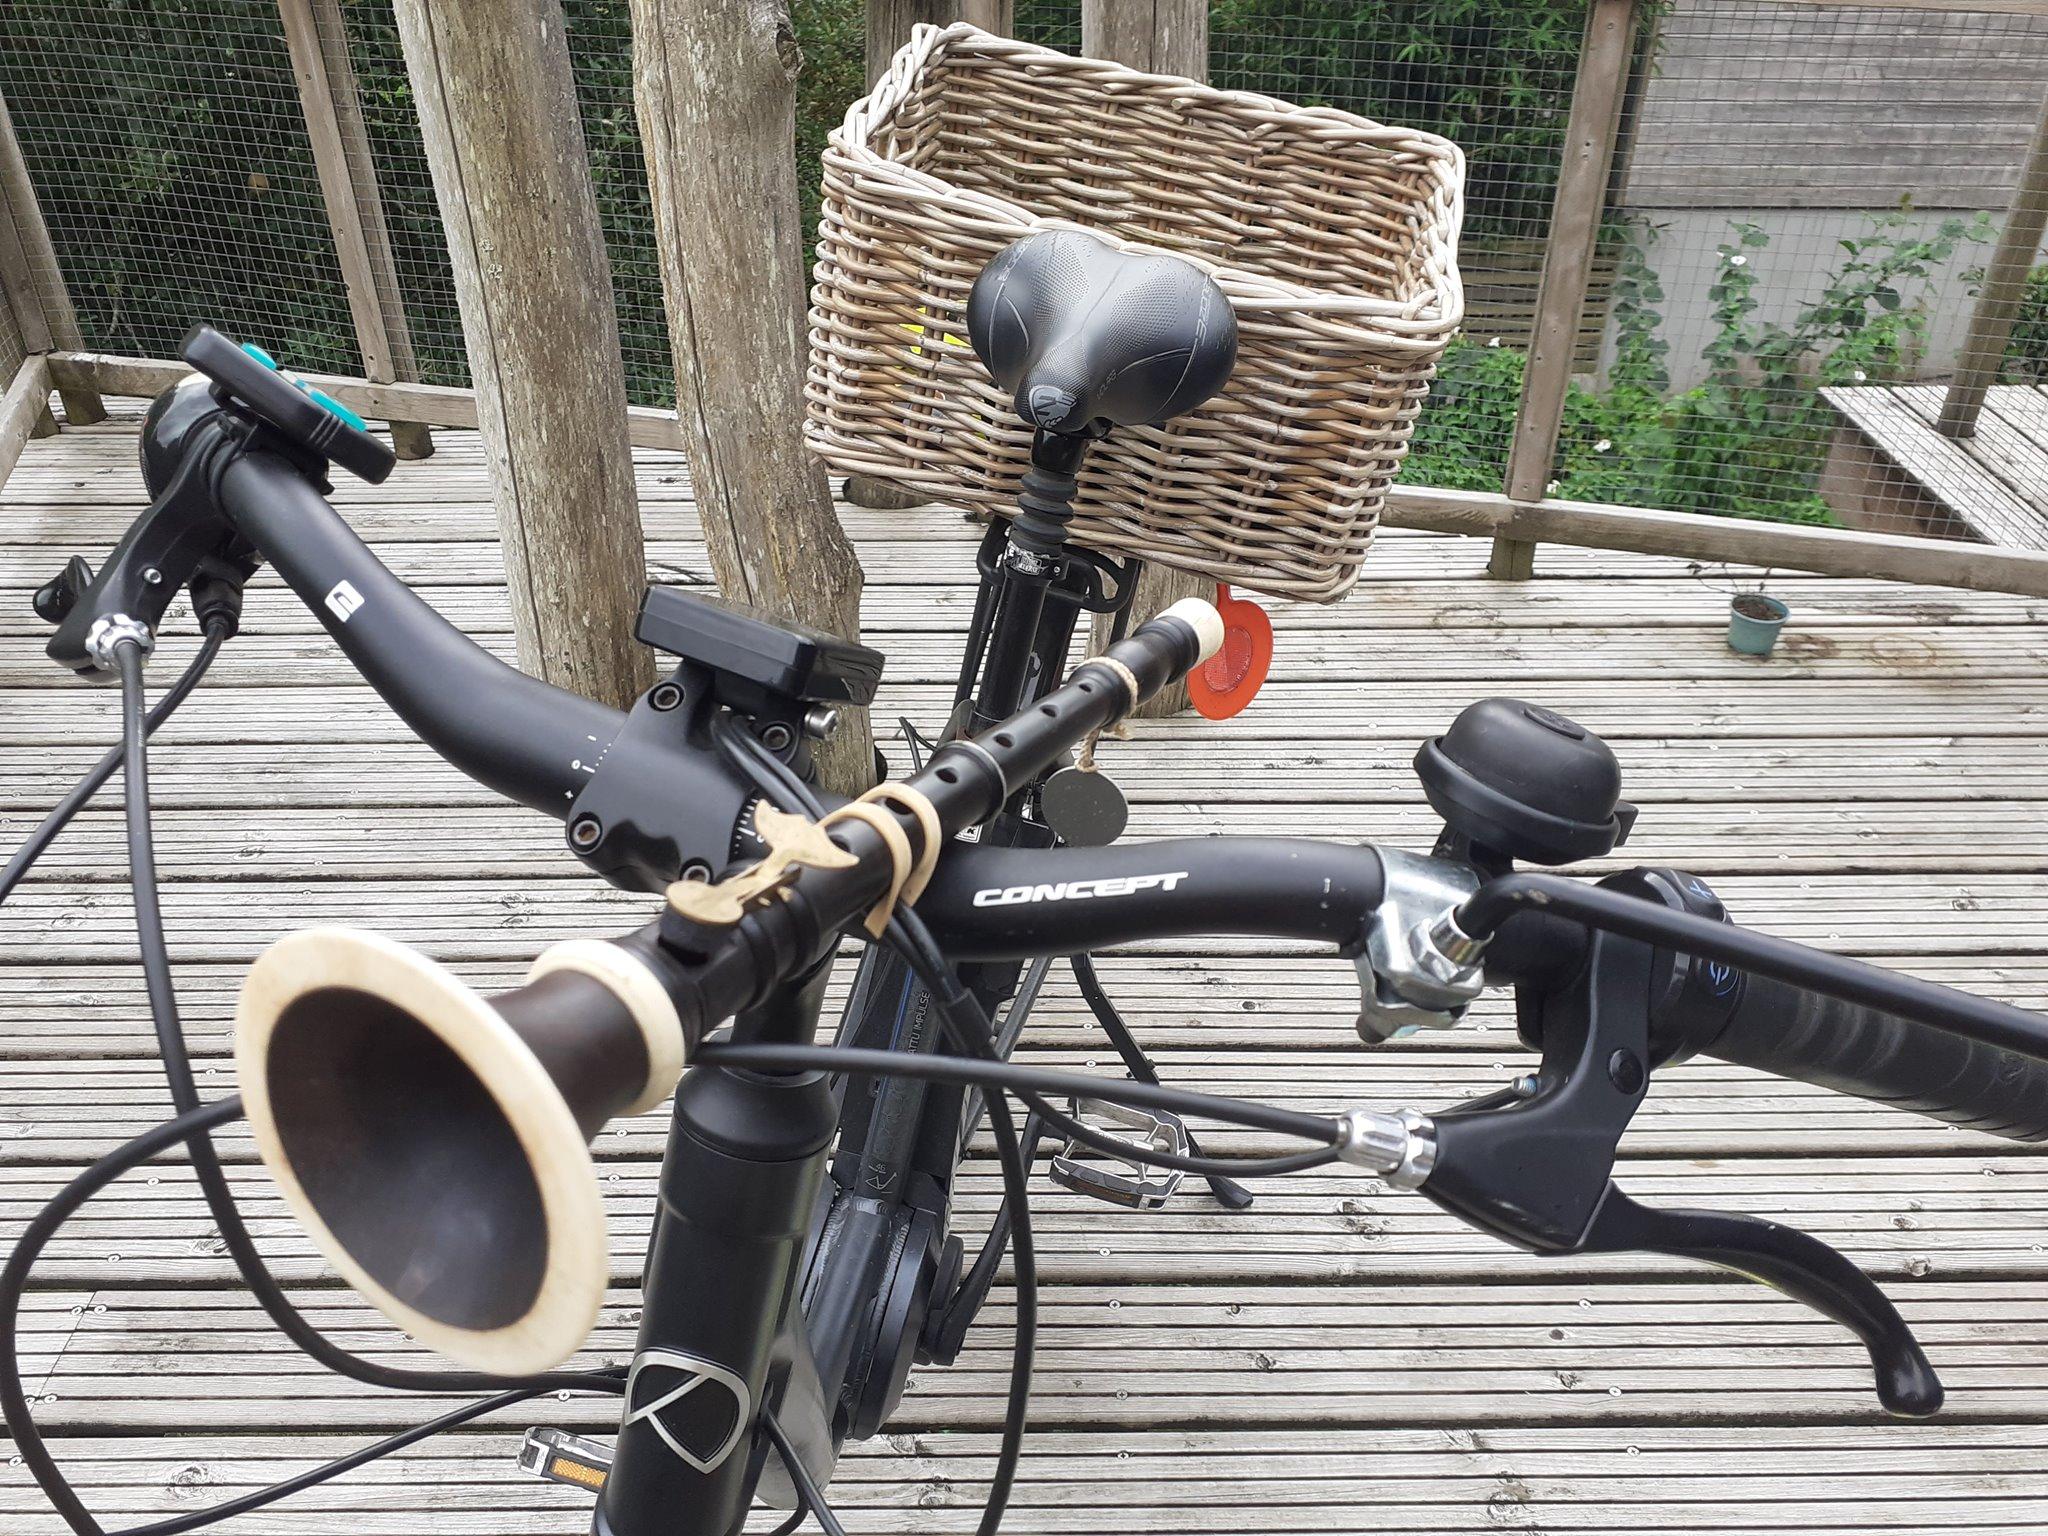 François MARTIN – Tradicyclette